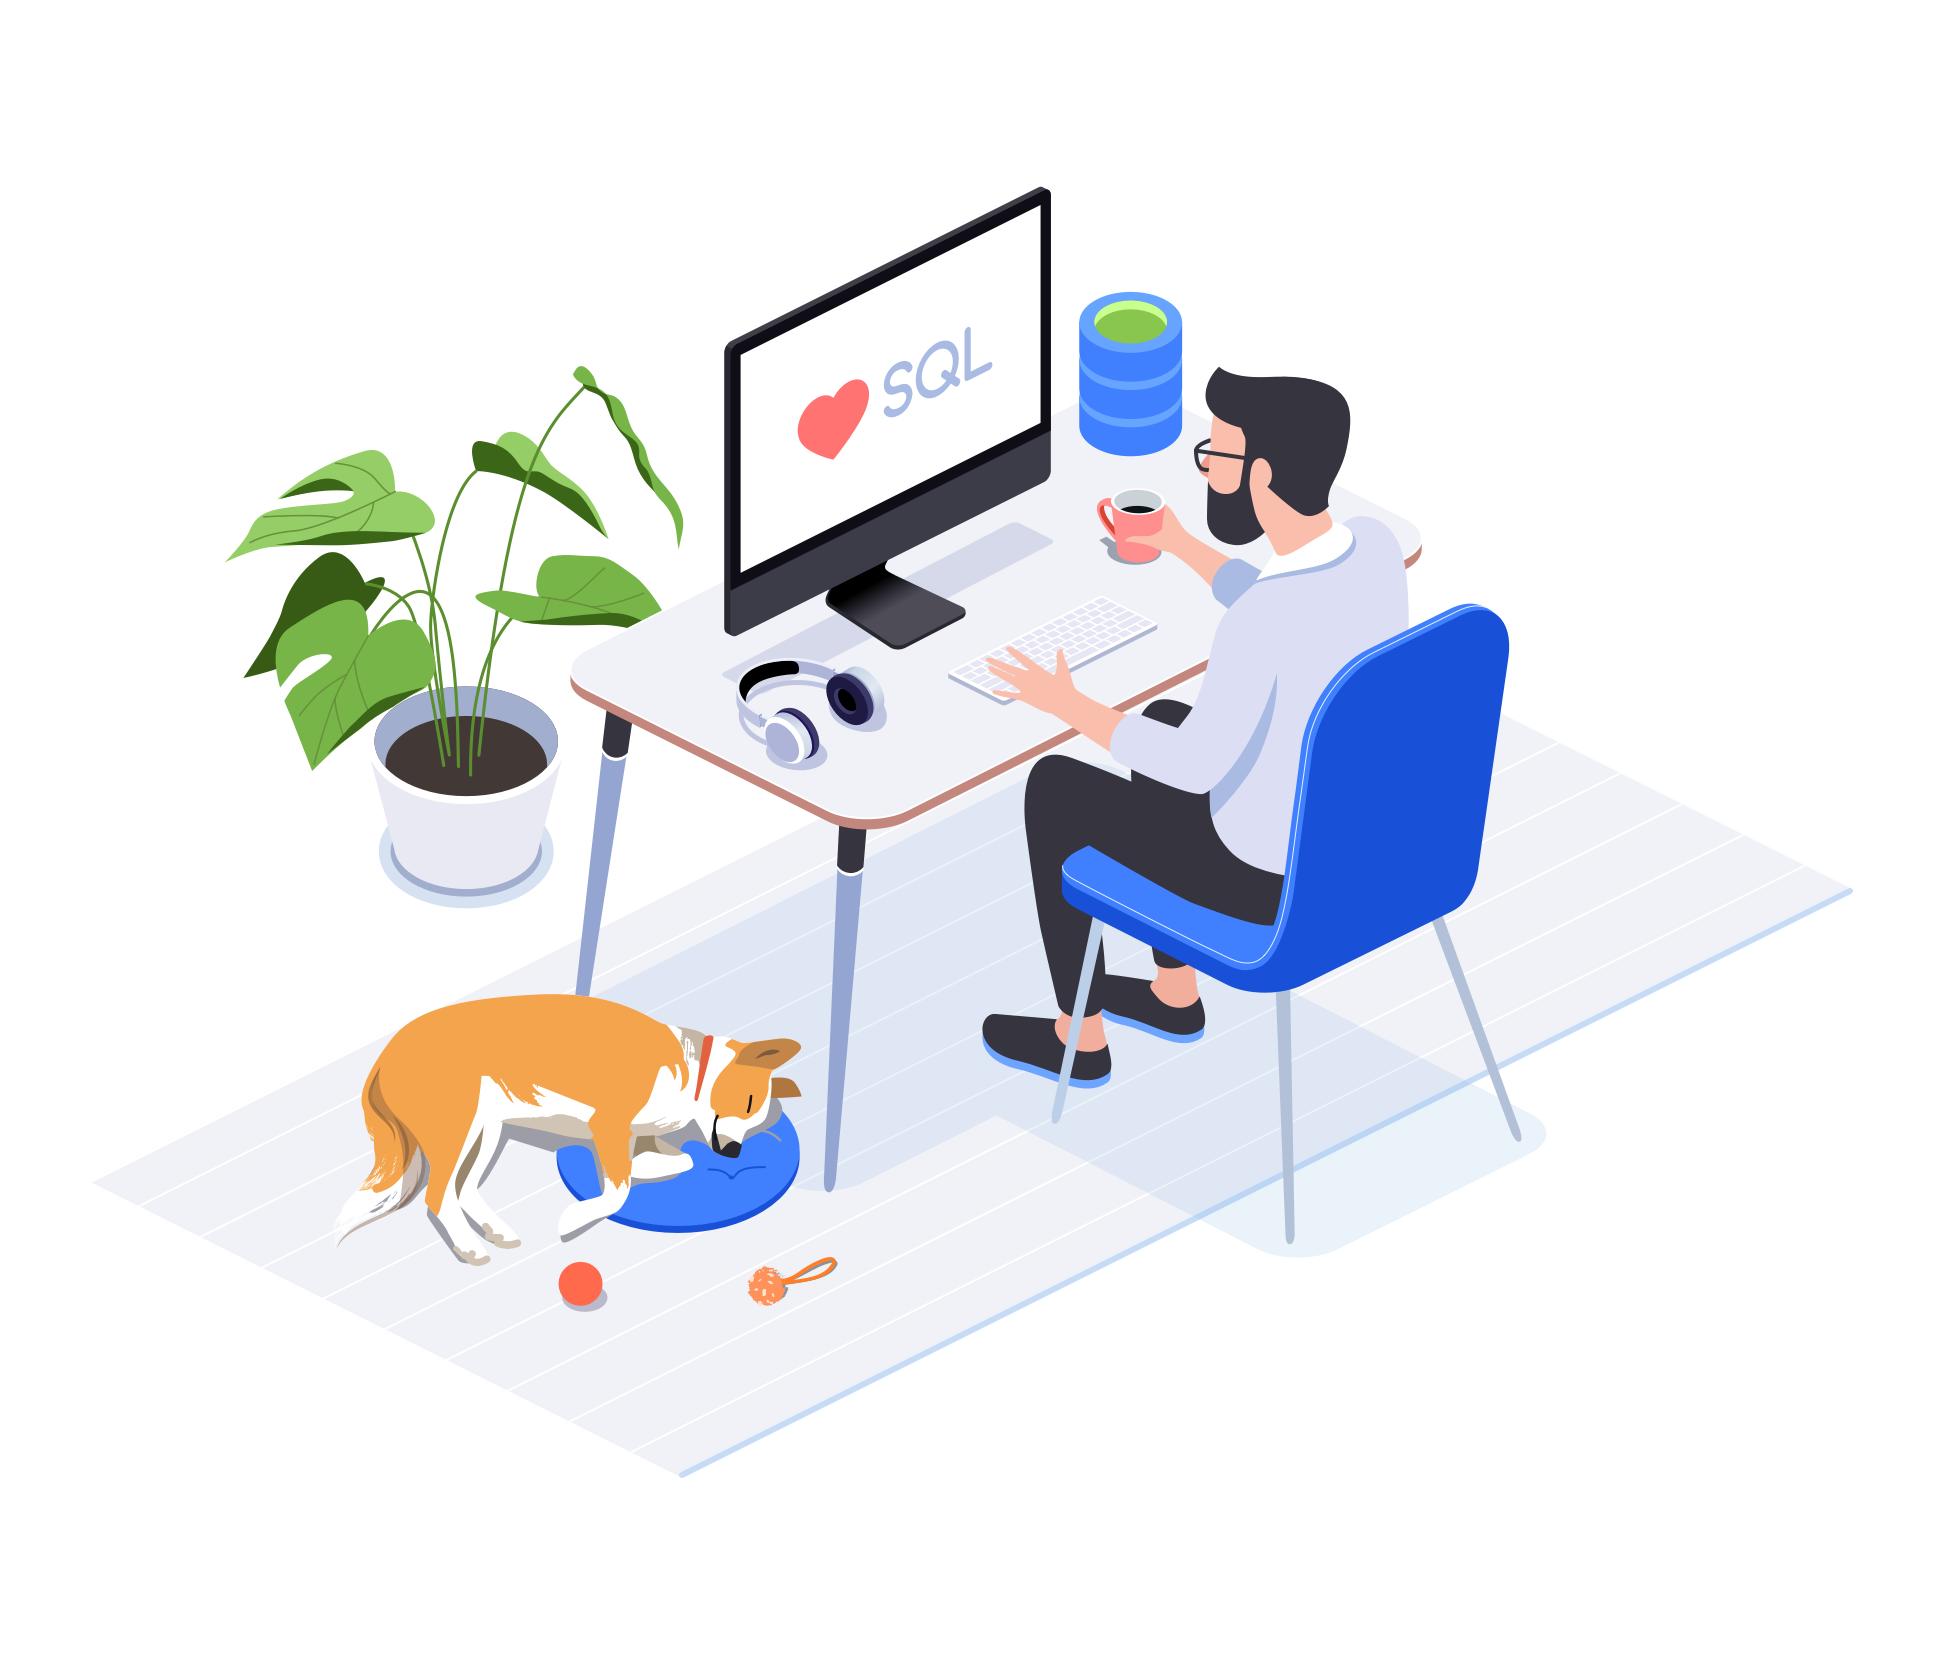 Redash helps you make sense of your data